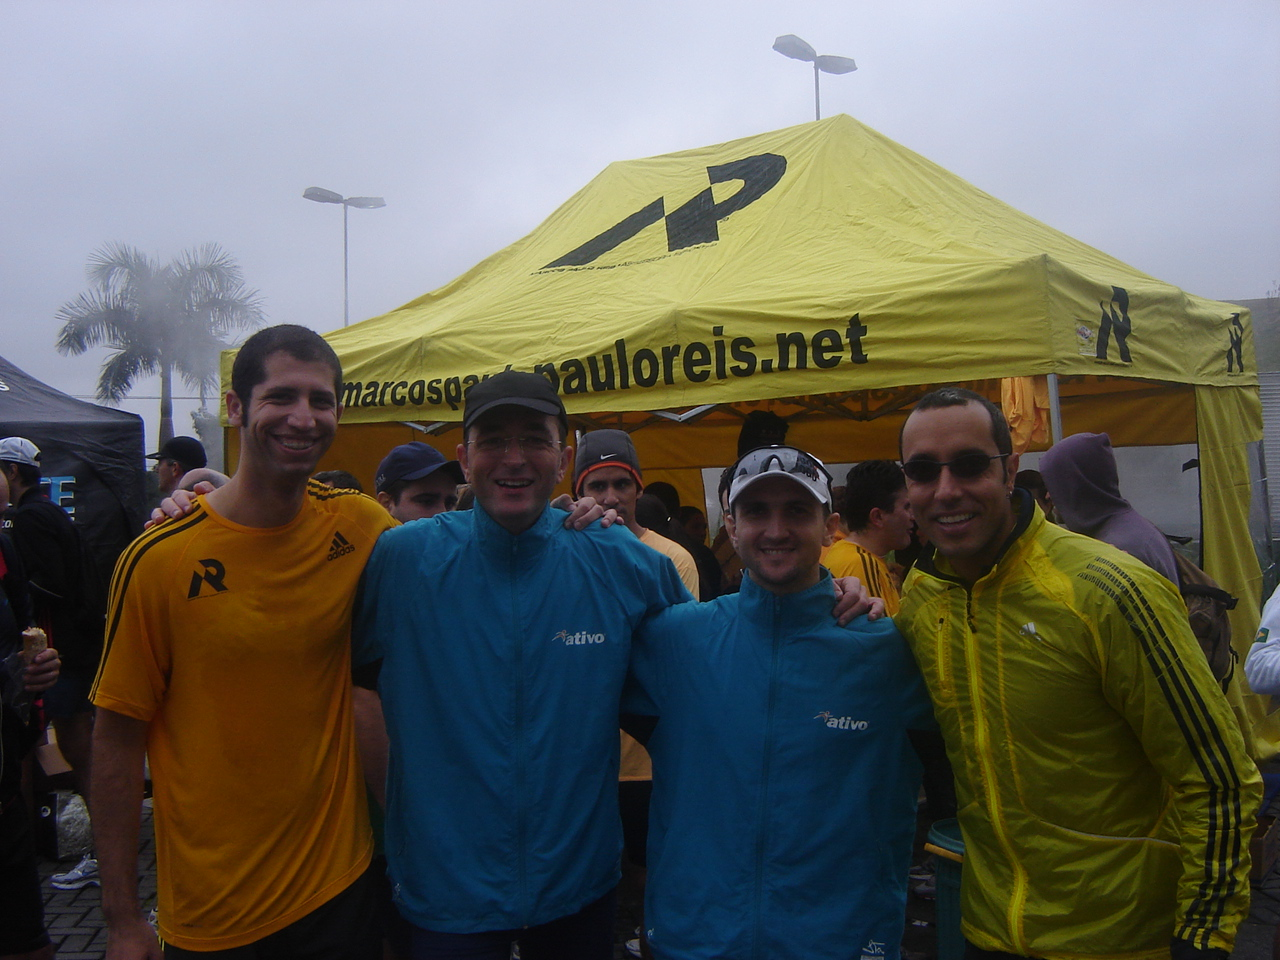 Cesar (Técnico MPR), Oswaldo (Atleta Ativo), Flavio Jose (Atleta Ativo) e Emerson Gomes (Técnico MPR)